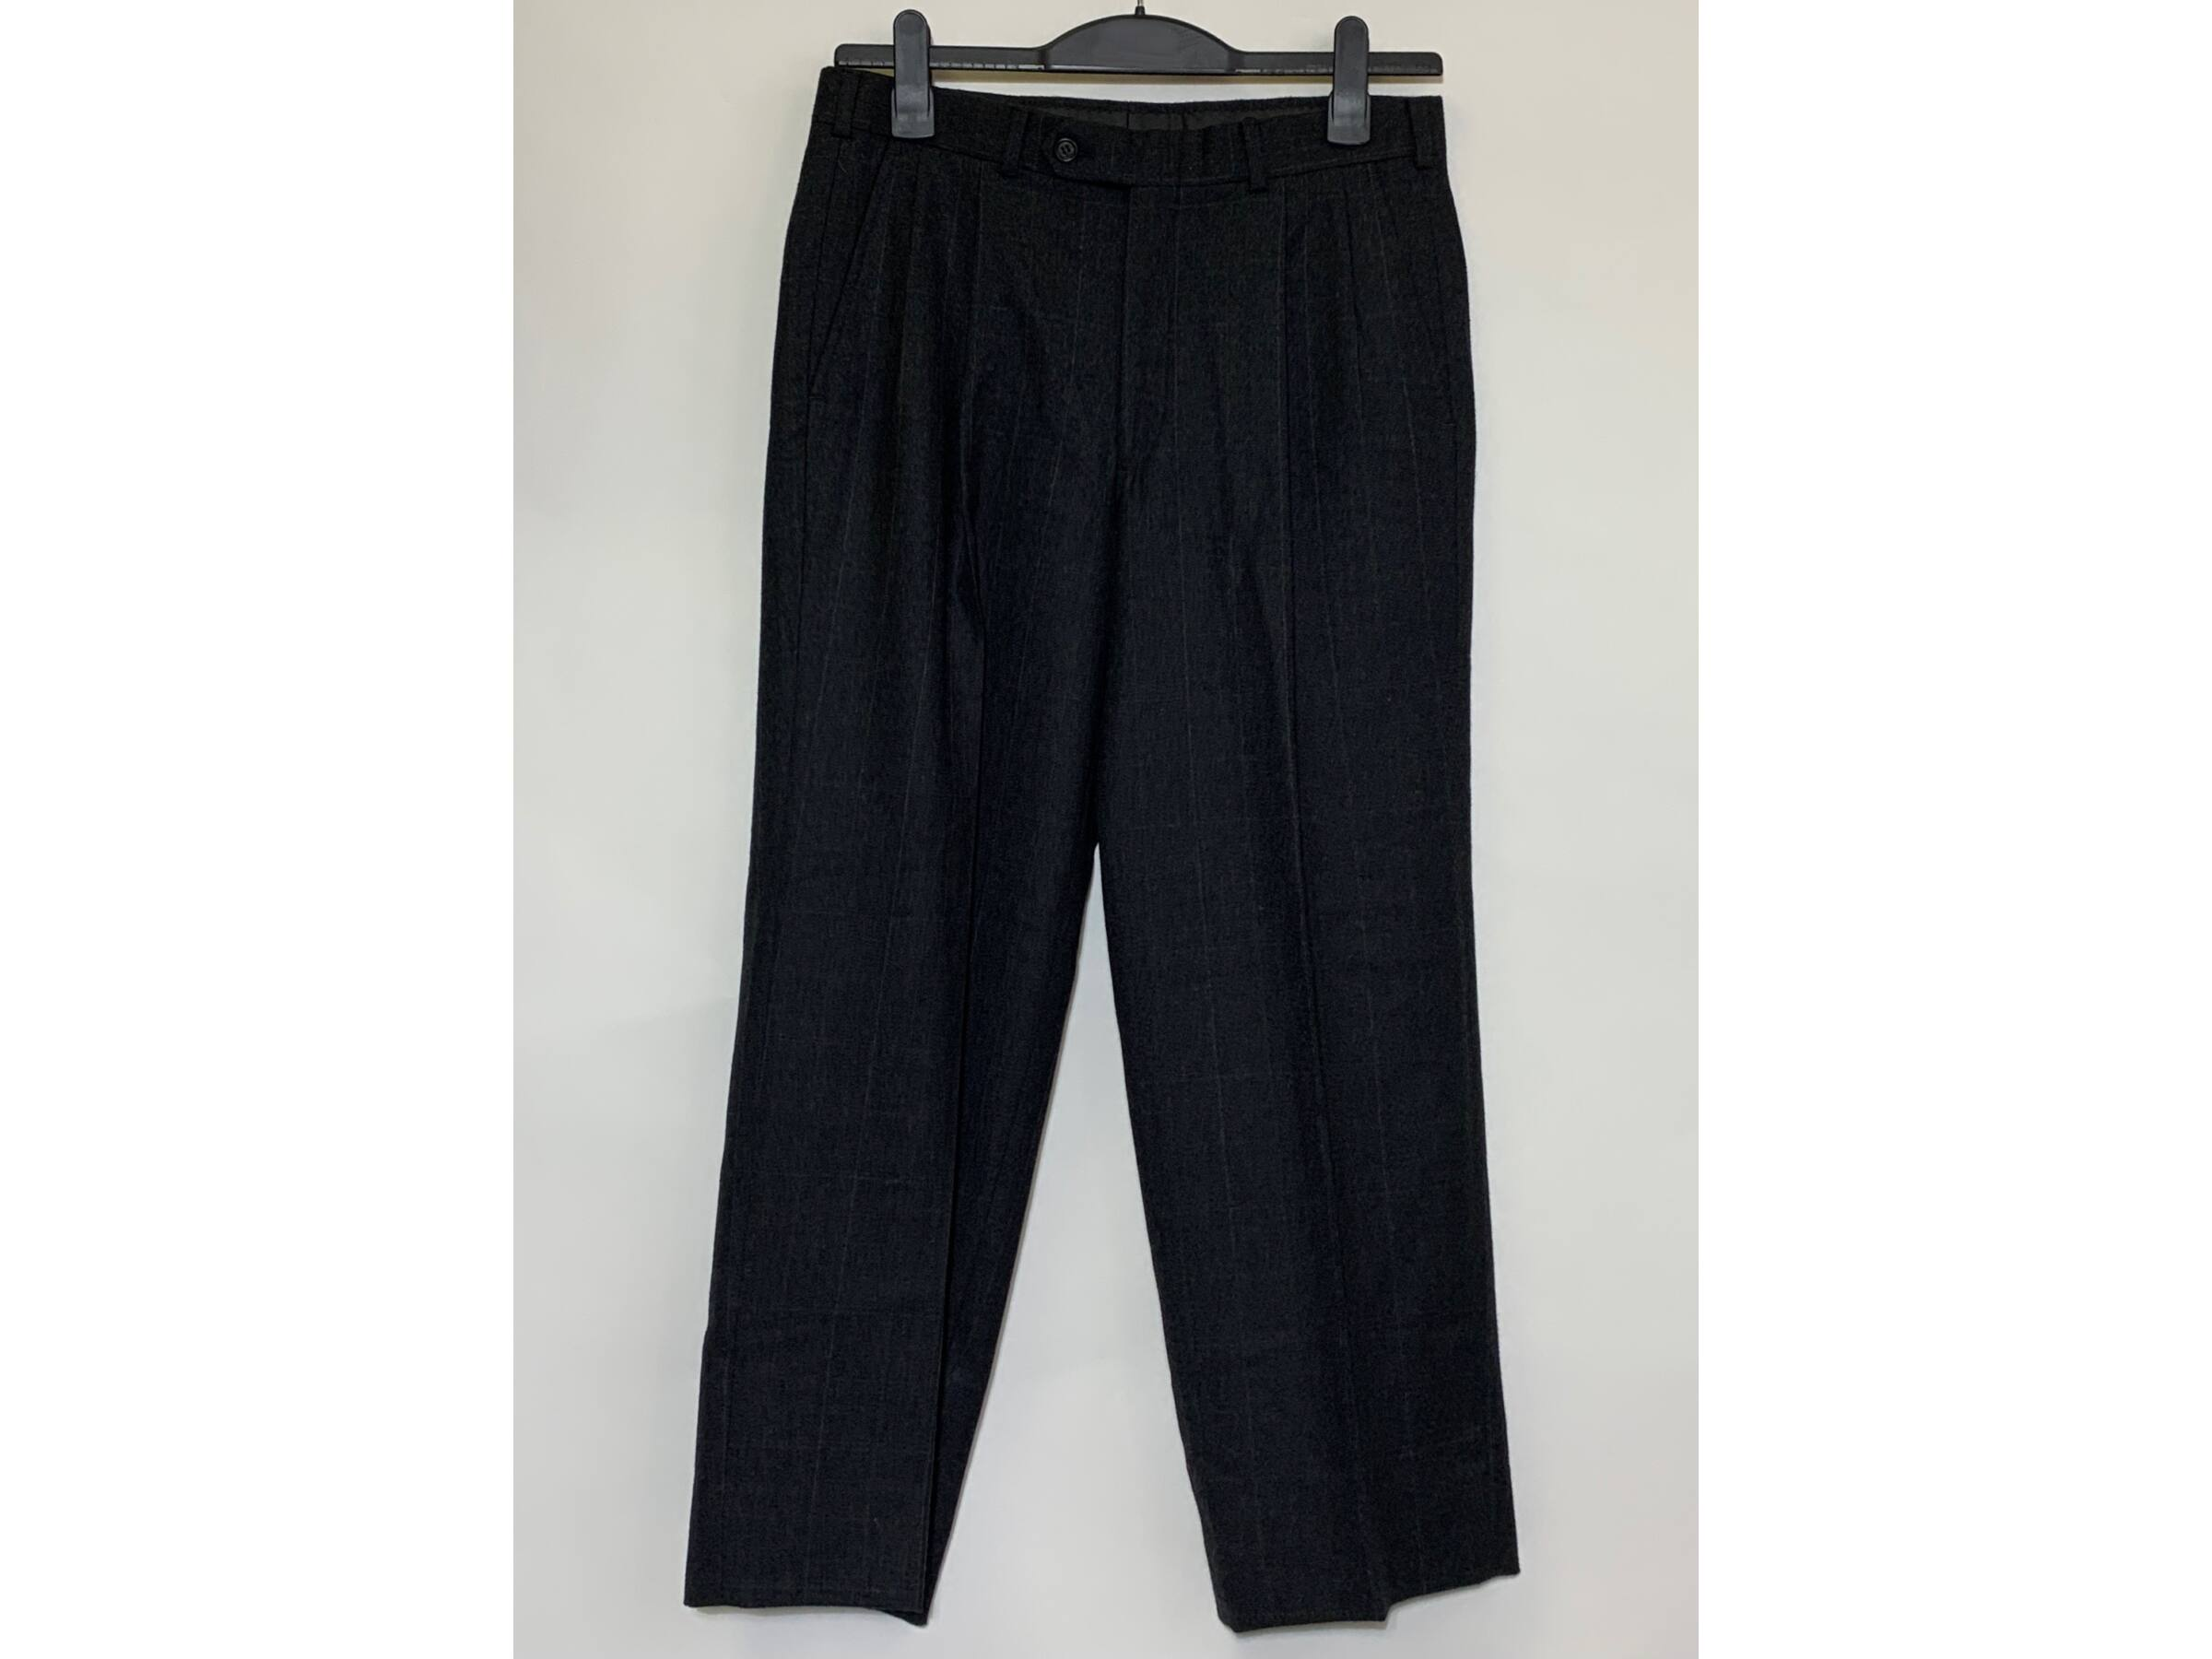 Vintage Burberrys nadrág (L)